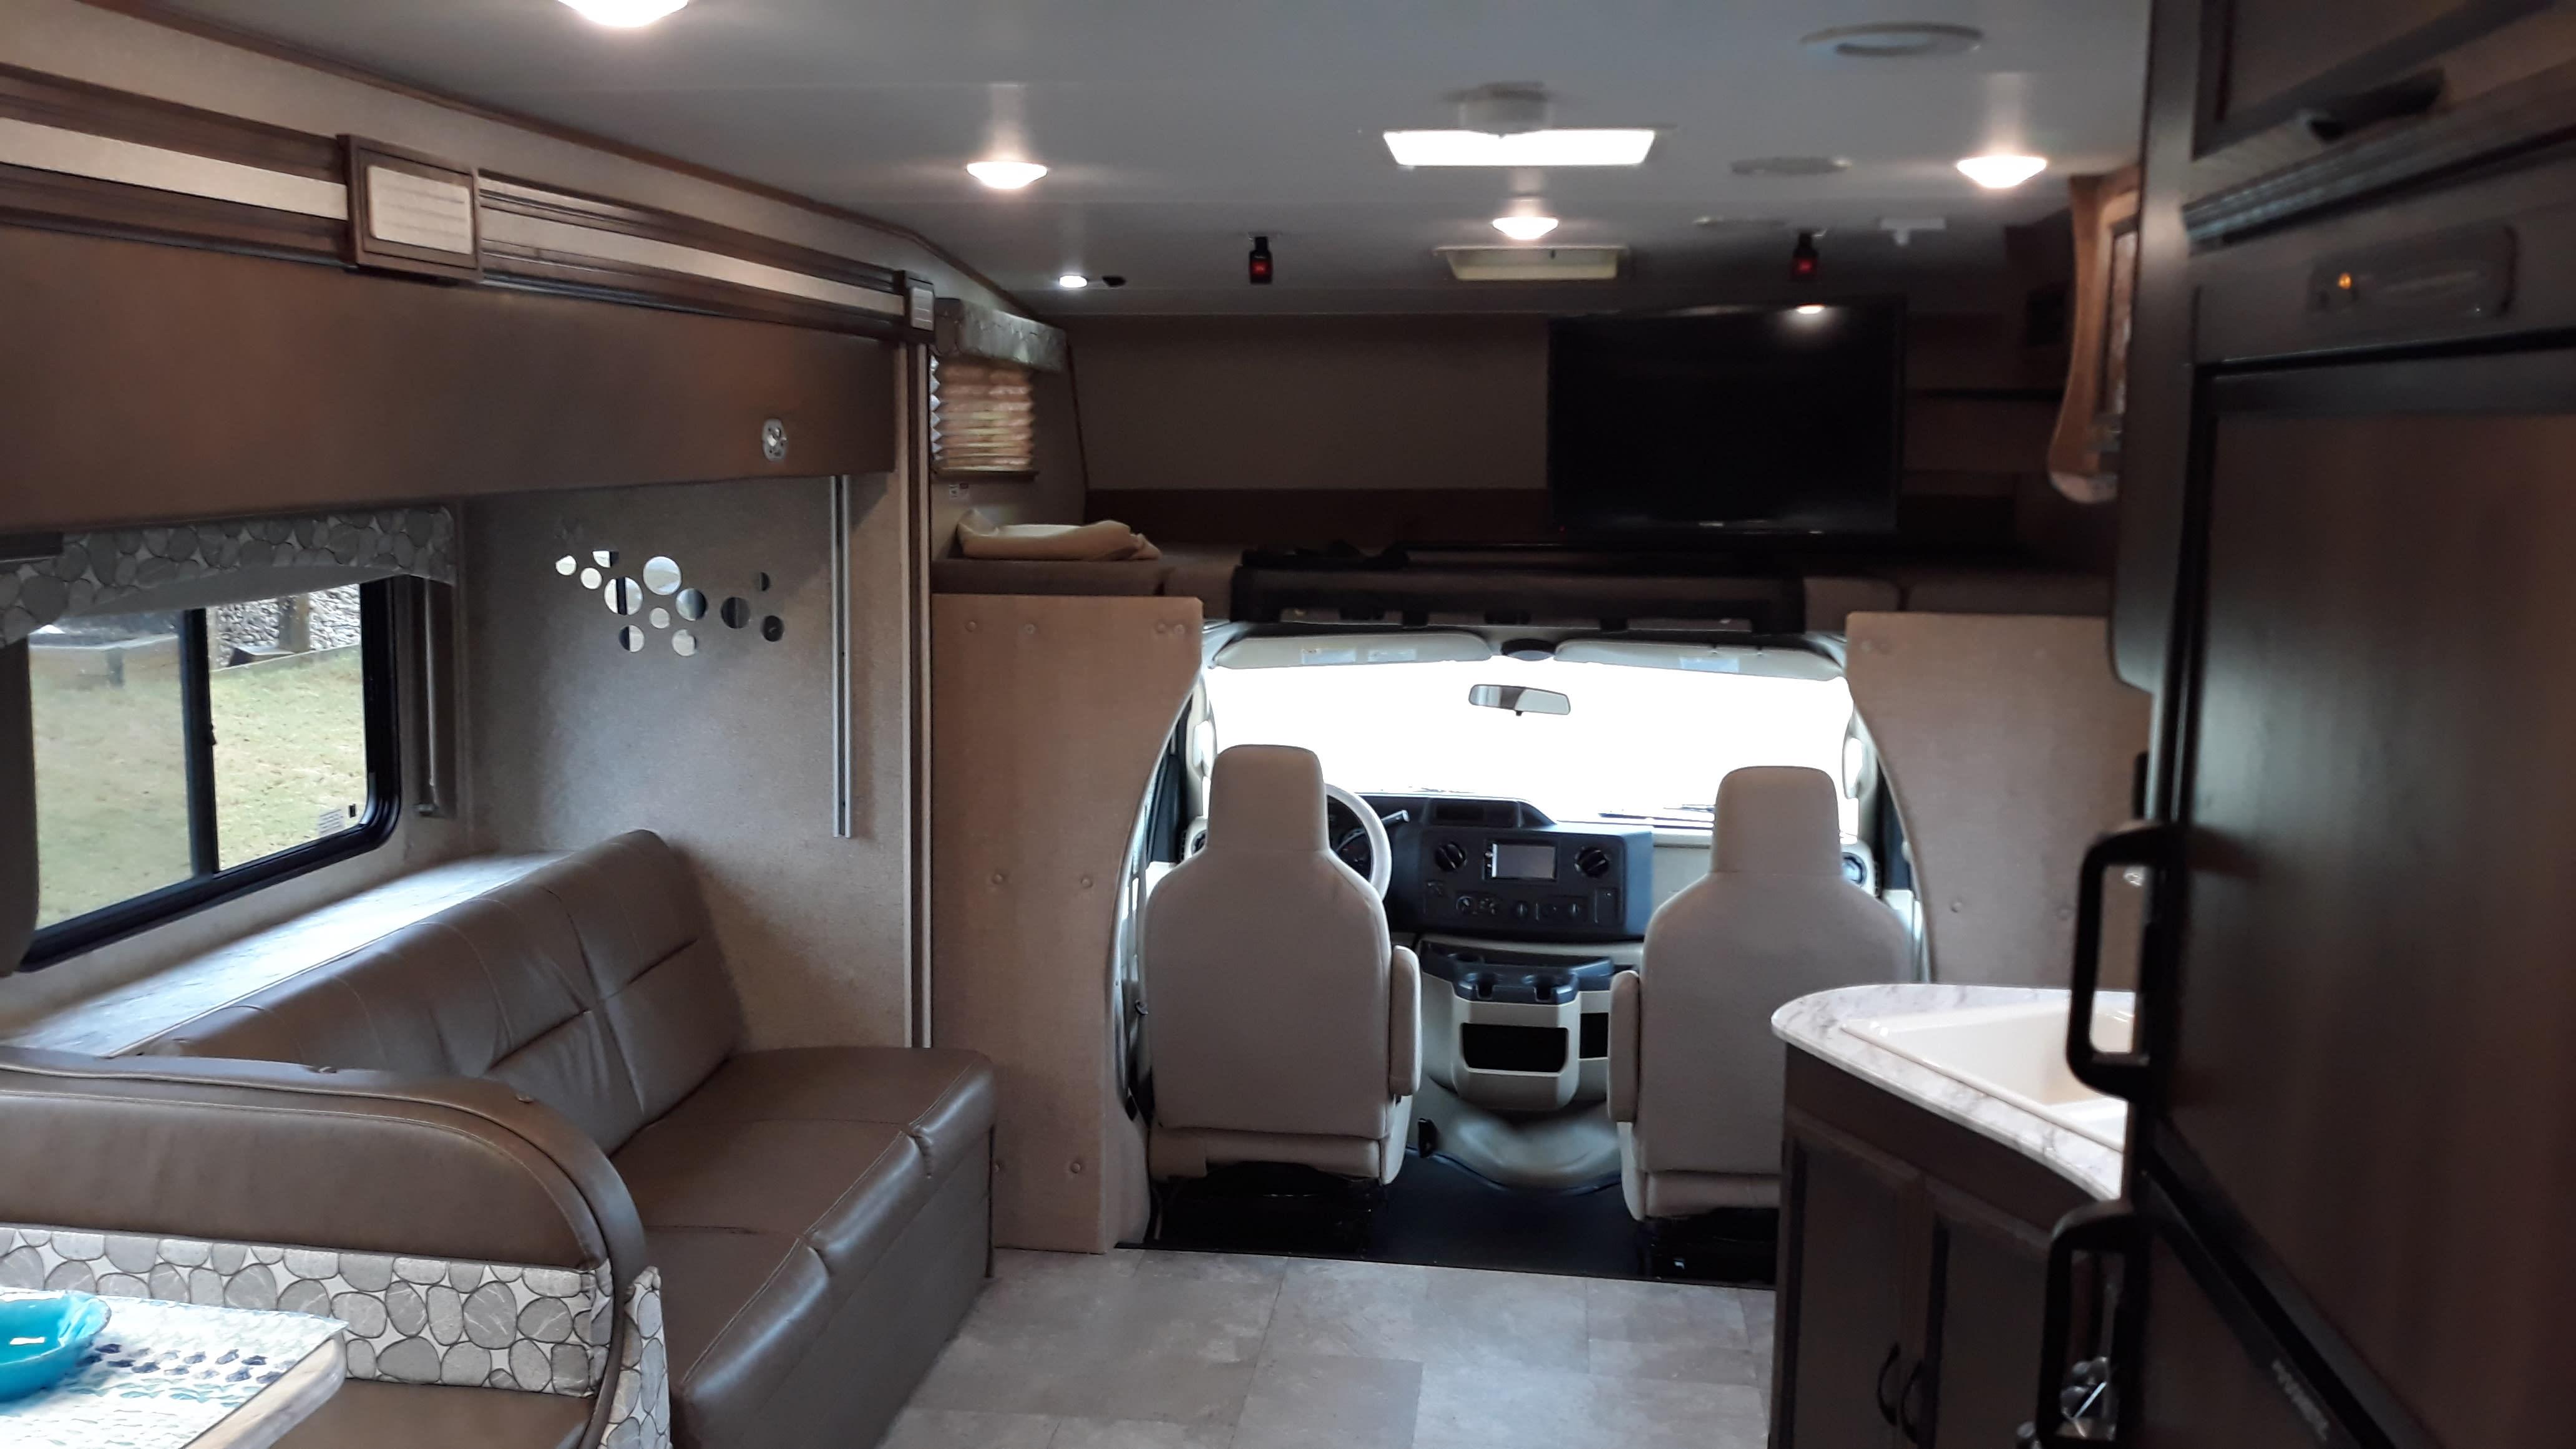 Seating & Driving Cabin. Coachmen Freelander 2018